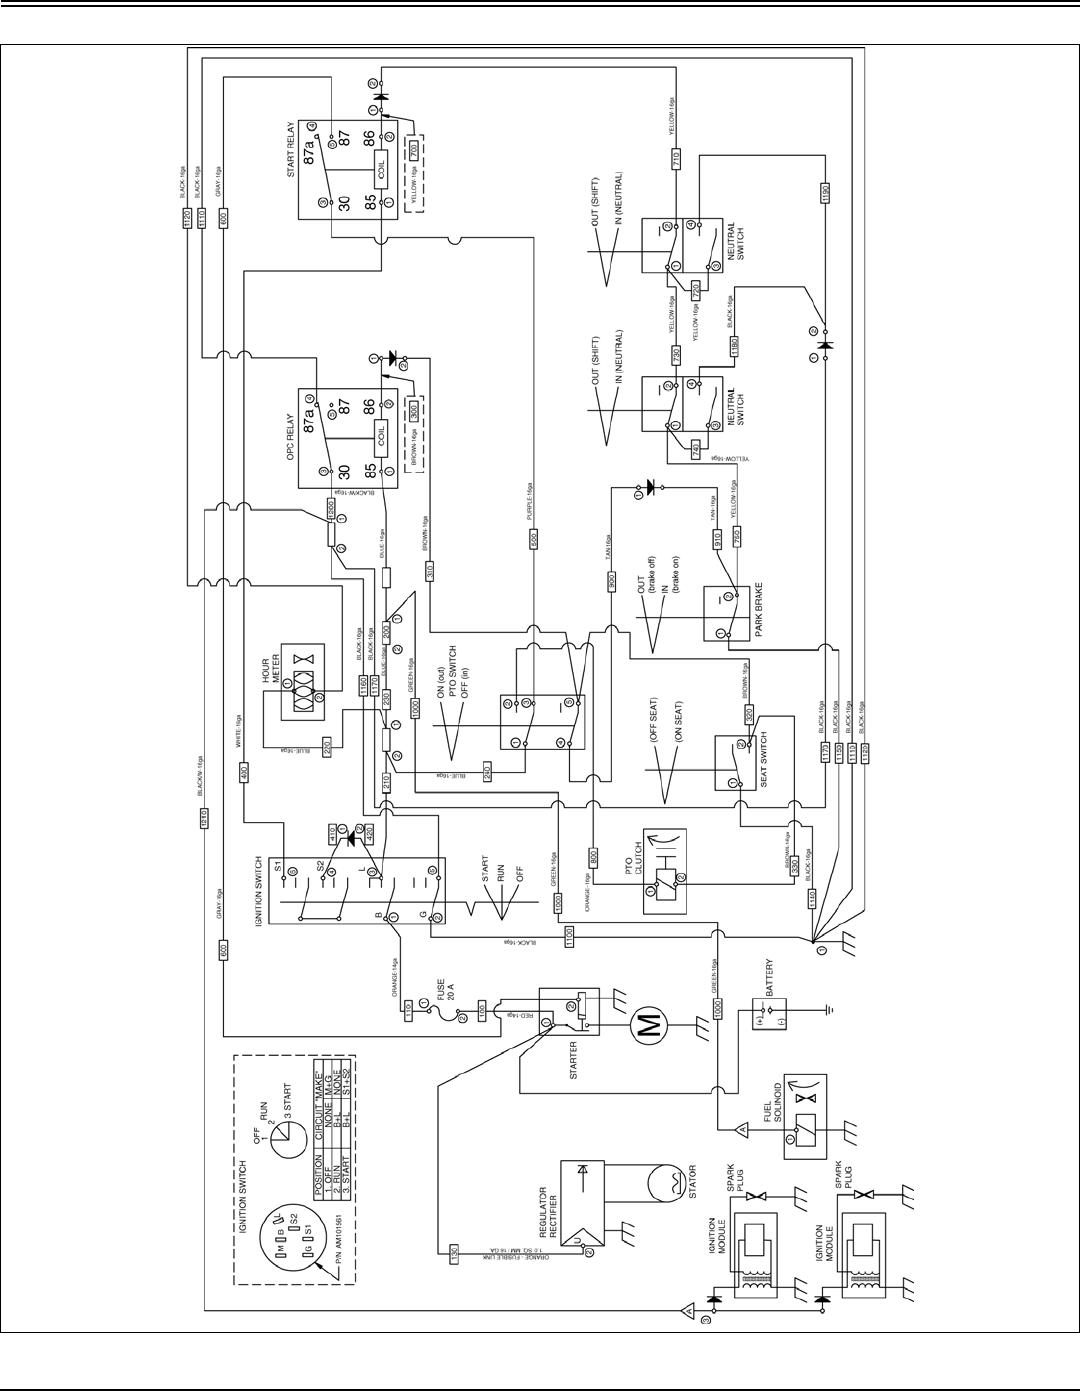 Great Dane Wiring Schematic Trusted Diagrams Mower Chatiot Diagram Library Of U2022 John Deere